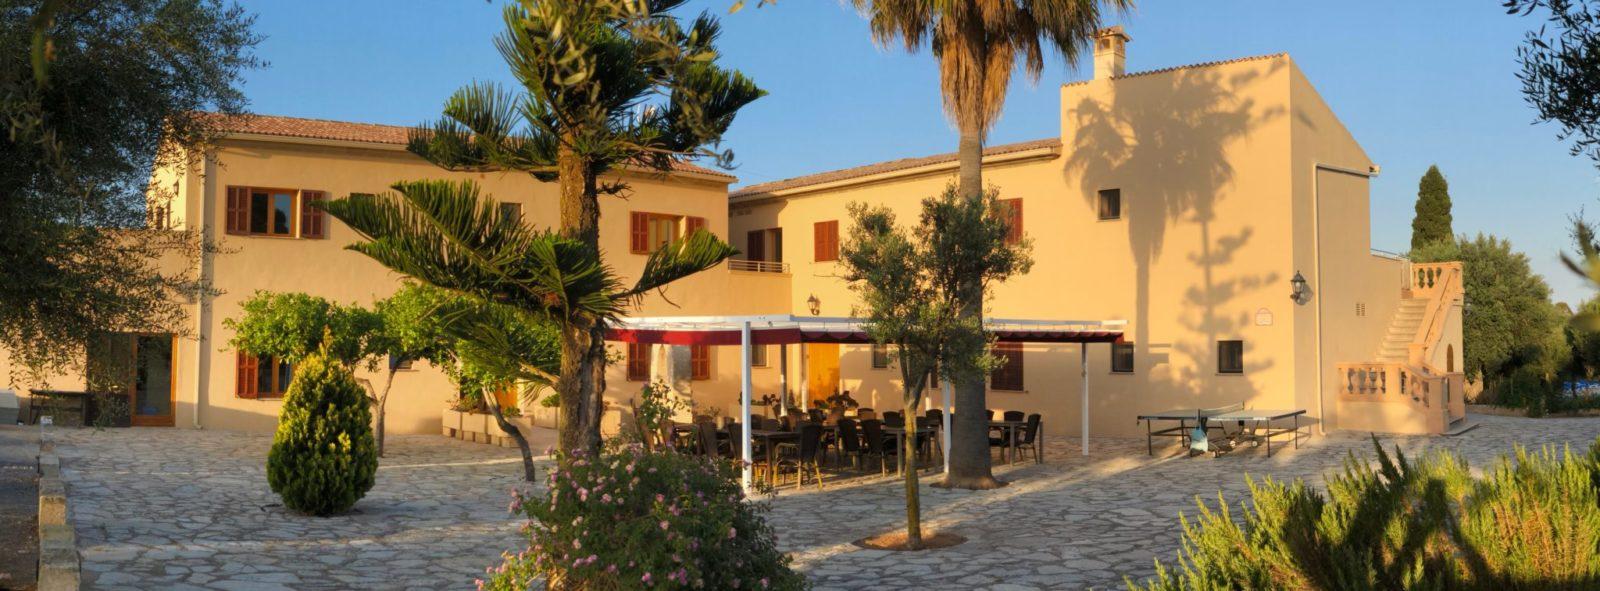 Panorama Haus 1 und 2 Finca Mallorca Can Agustin